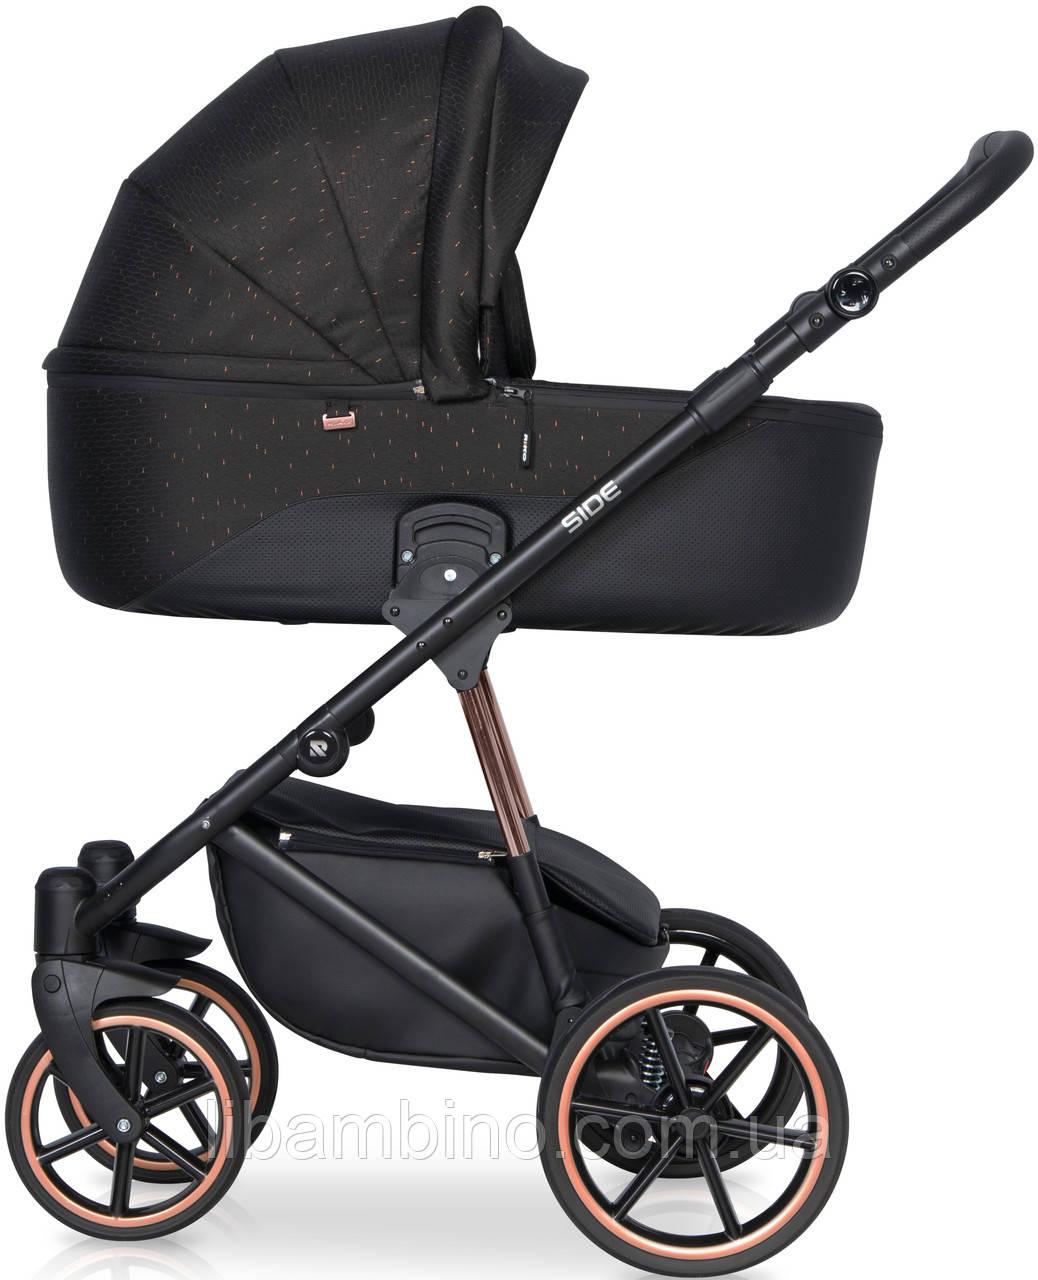 Дитяча універсальна коляска 2 в 1 Riko Side 06 Cooper